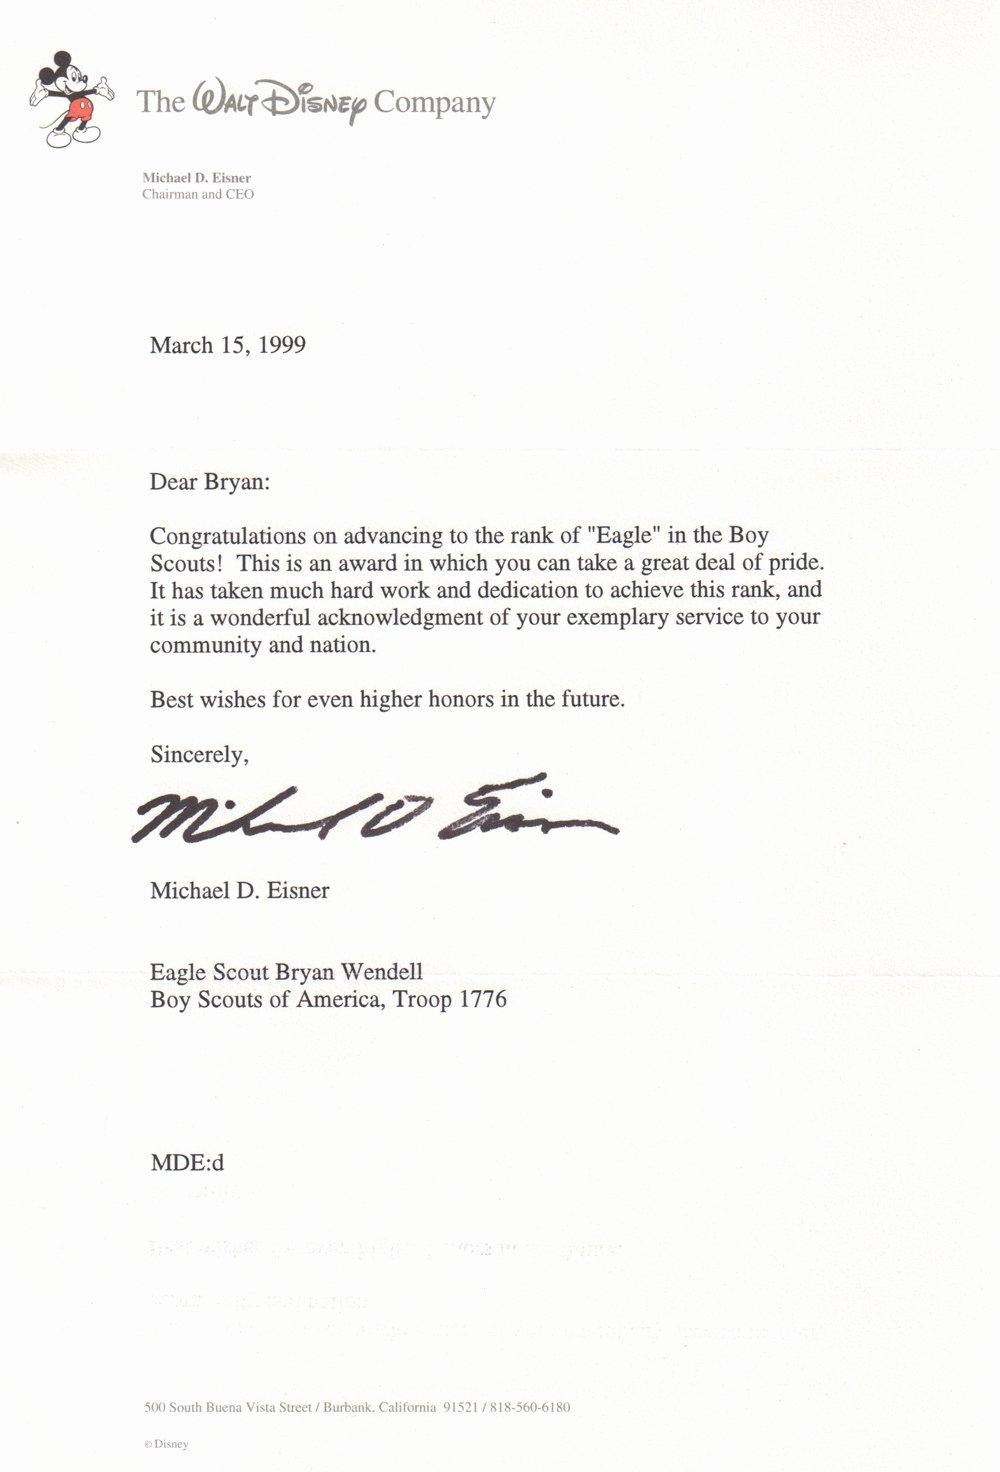 Boy Scout Letter Of Recommendation Elegant Eagle Scout Re Mendation Letter Template Collection